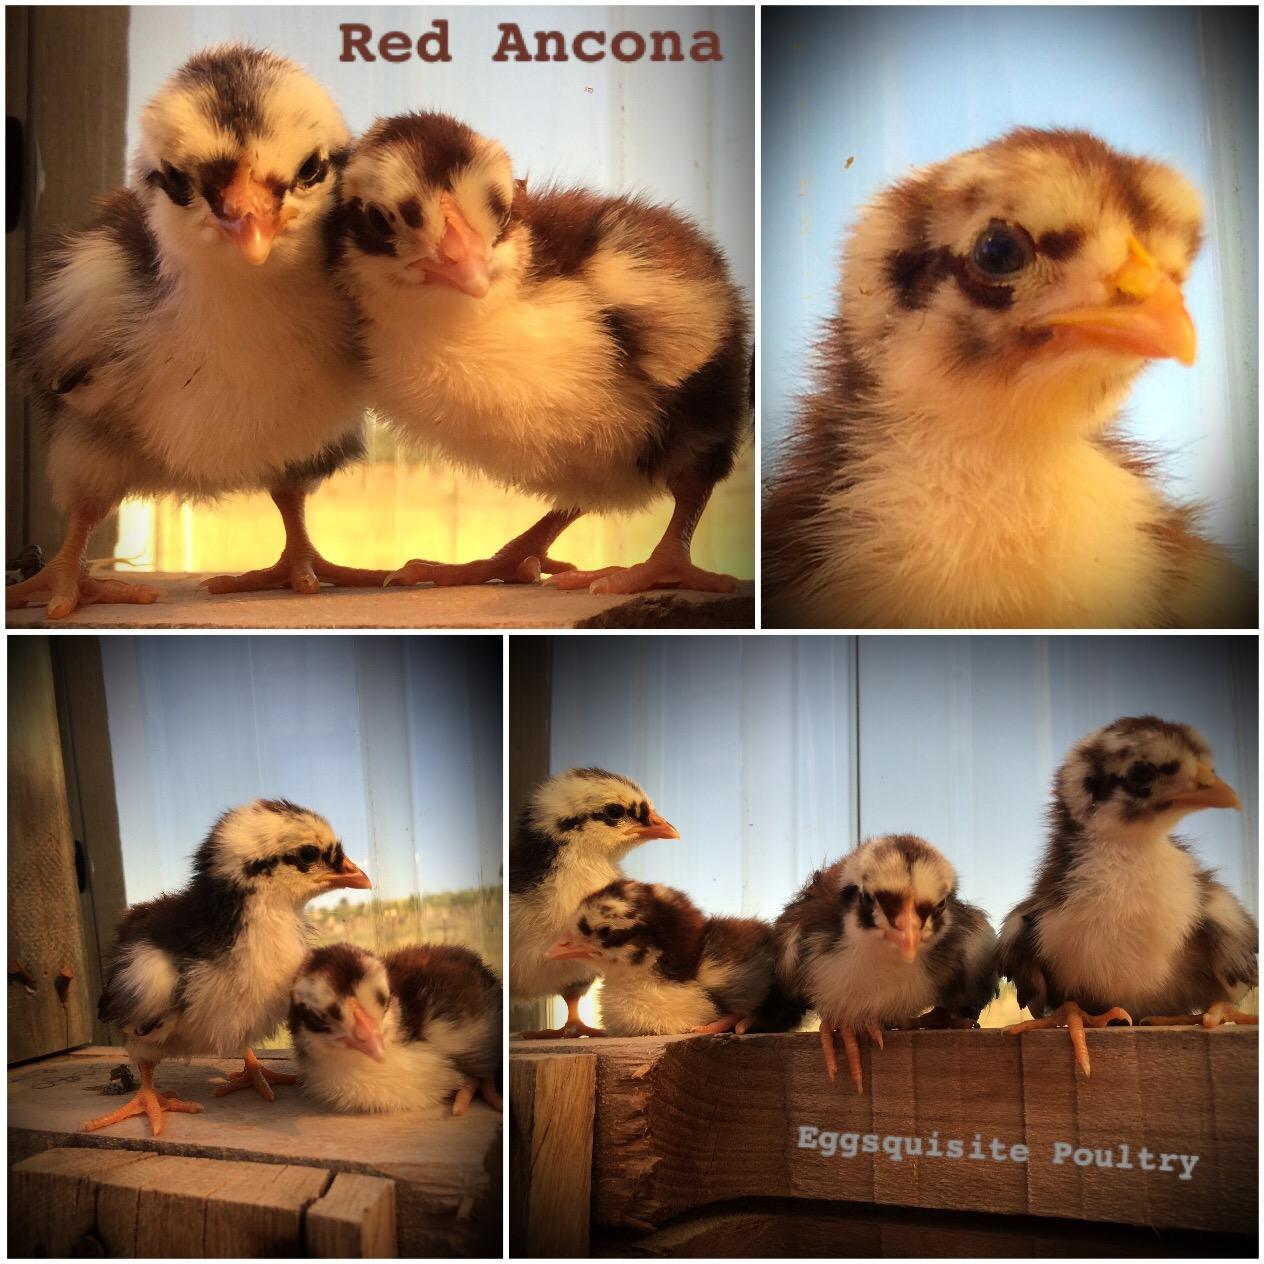 for sale u2013 kildare park olive farm home of eggsquisite poultry